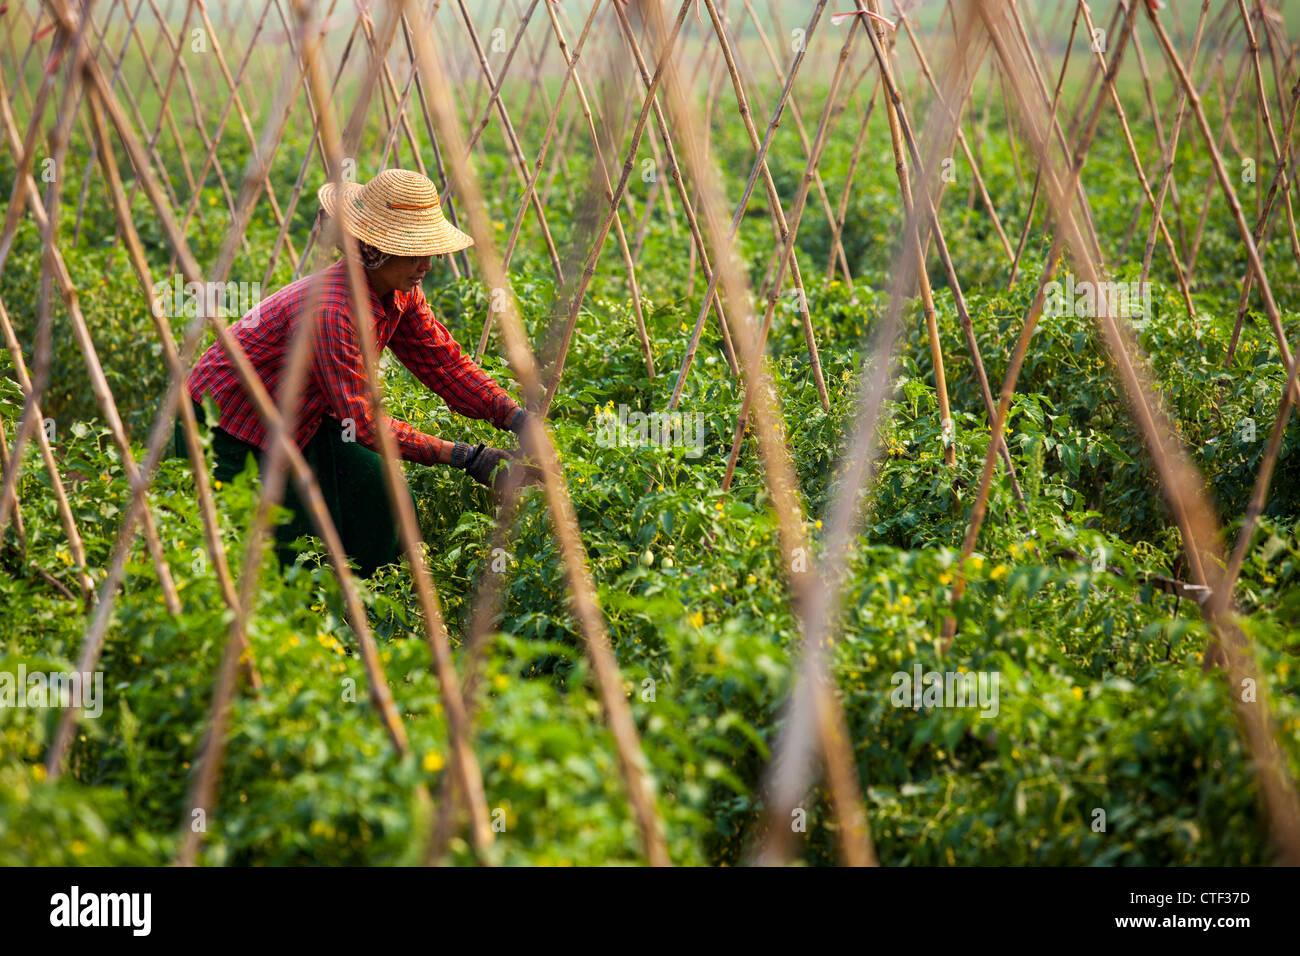 La mujer en Myanmar cultivo de tomate Imagen De Stock